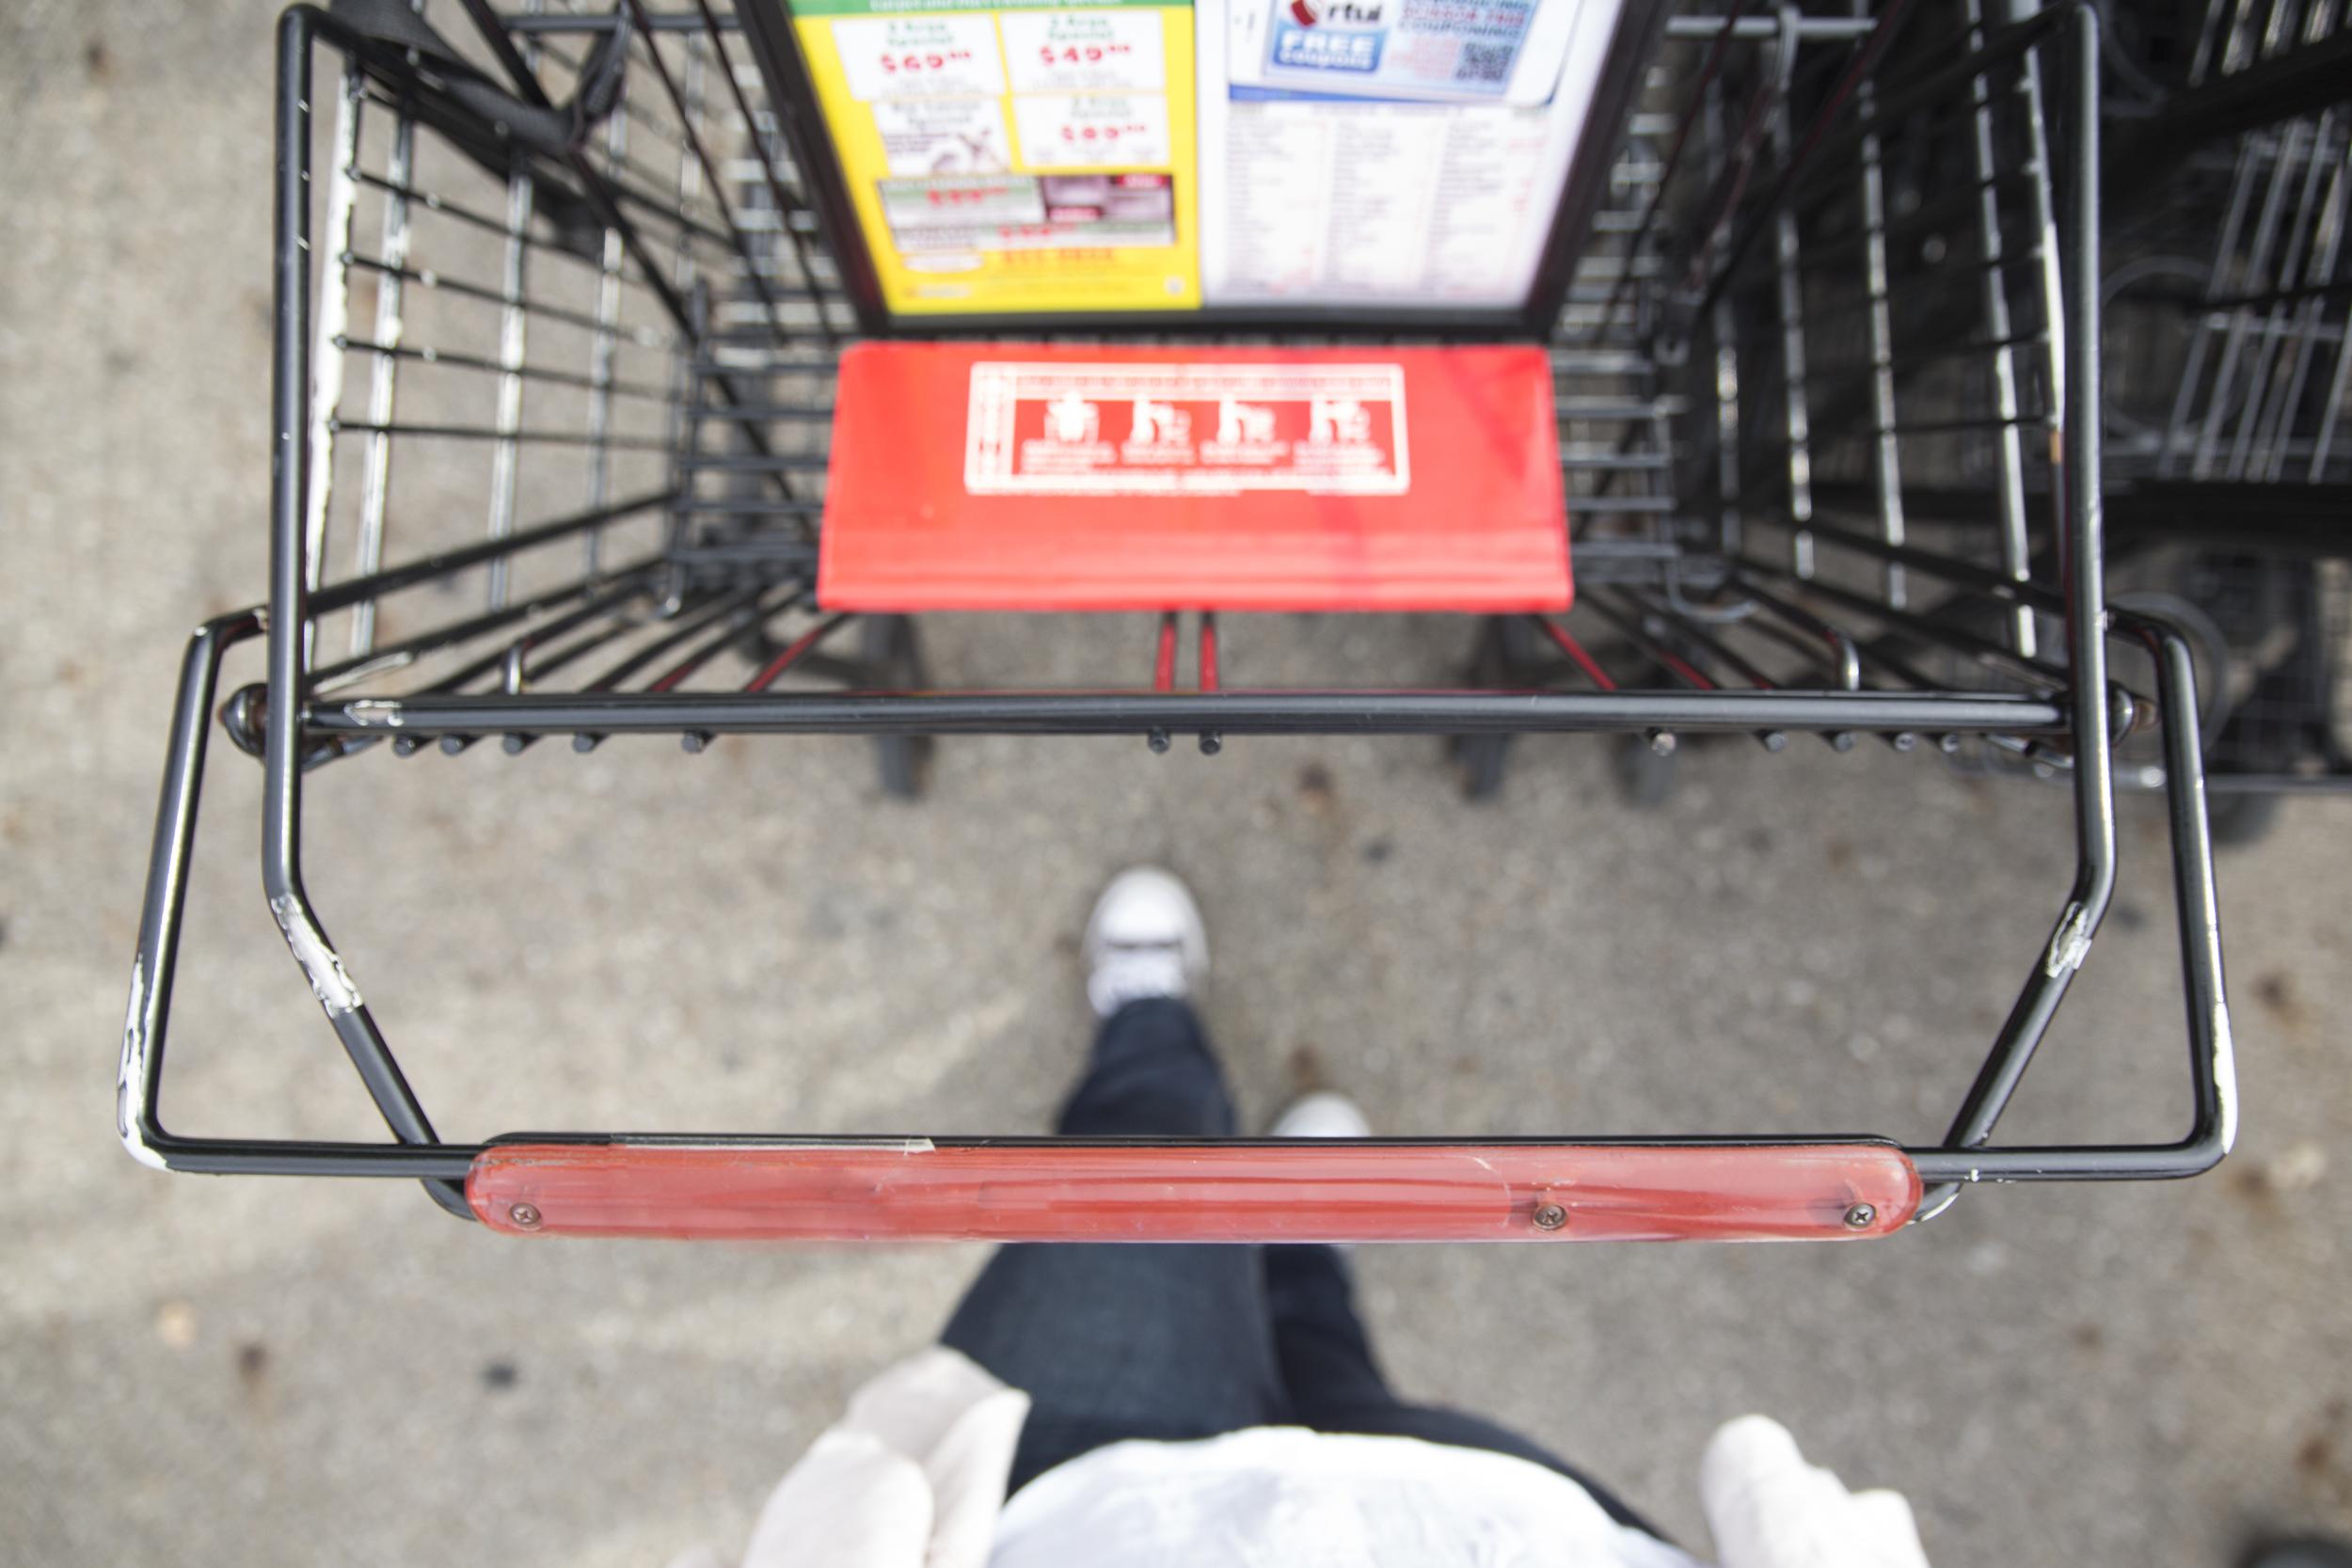 shopping-cart-photo.jpg